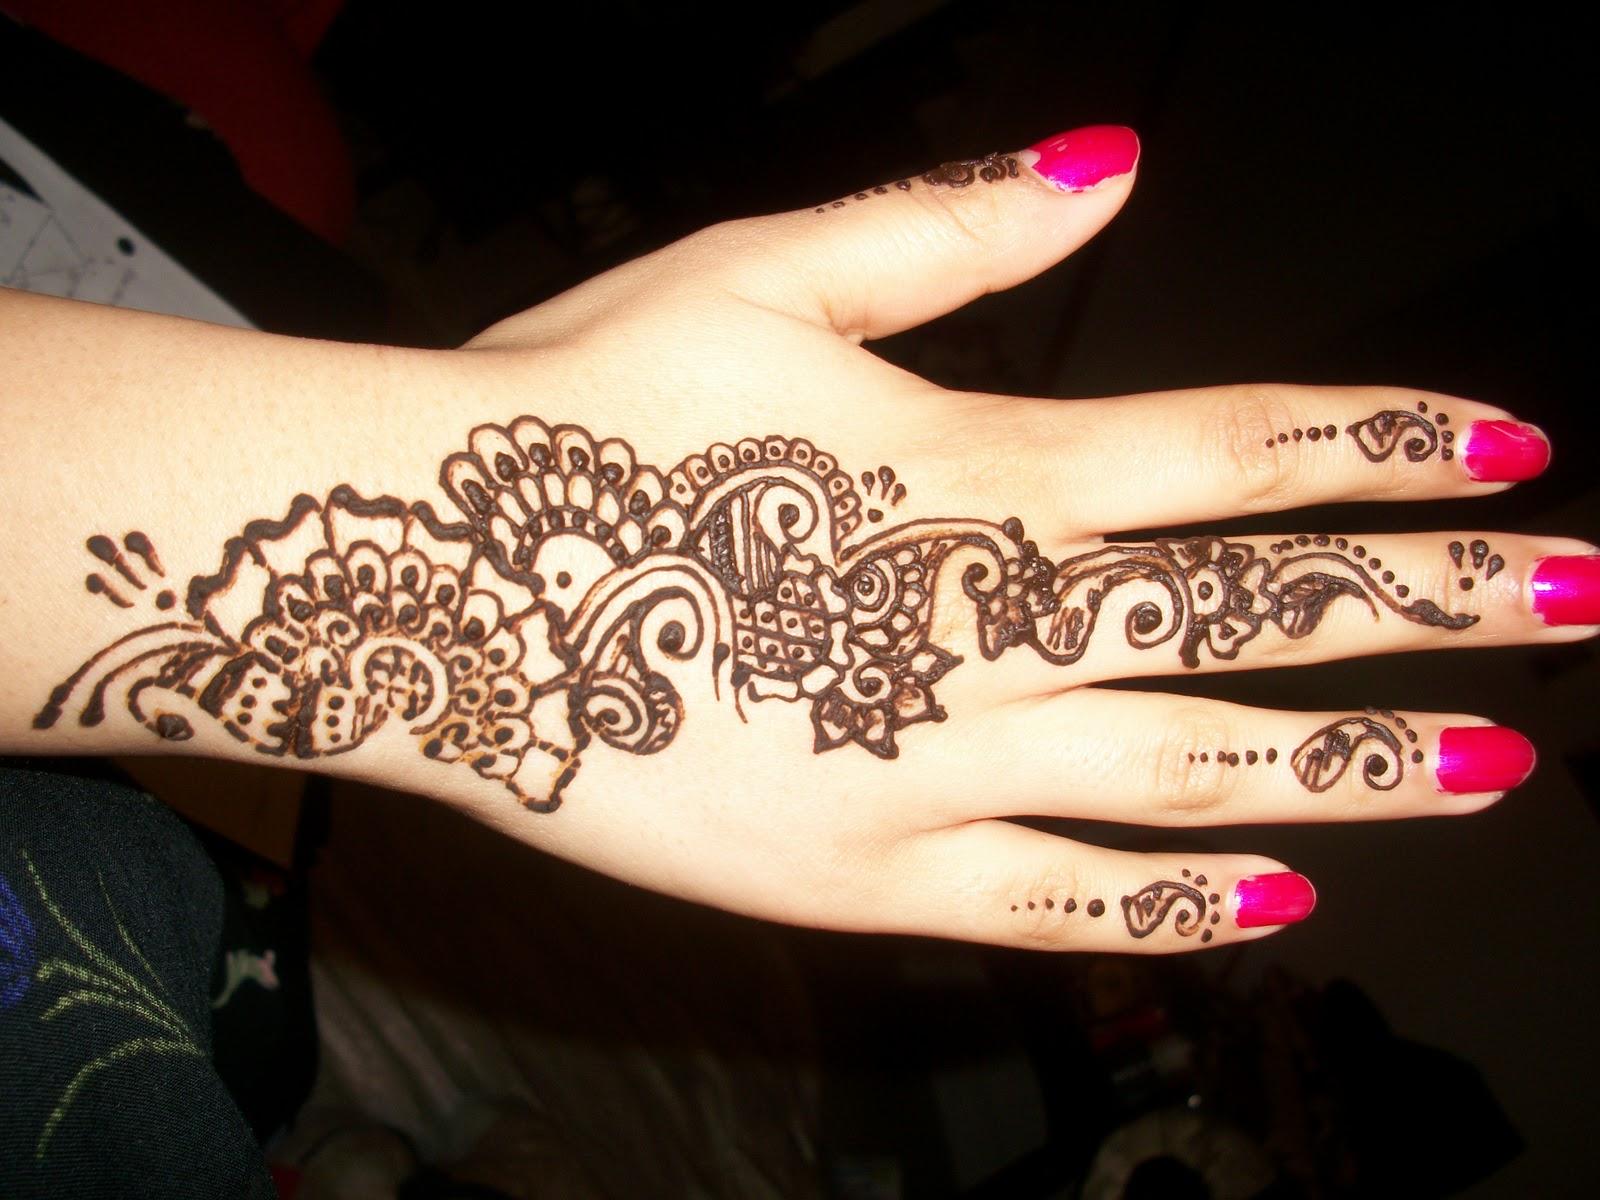 Simple Mehndi Patterns Wallpapers : Beautiful arabic henna mehndi designs for girls hands